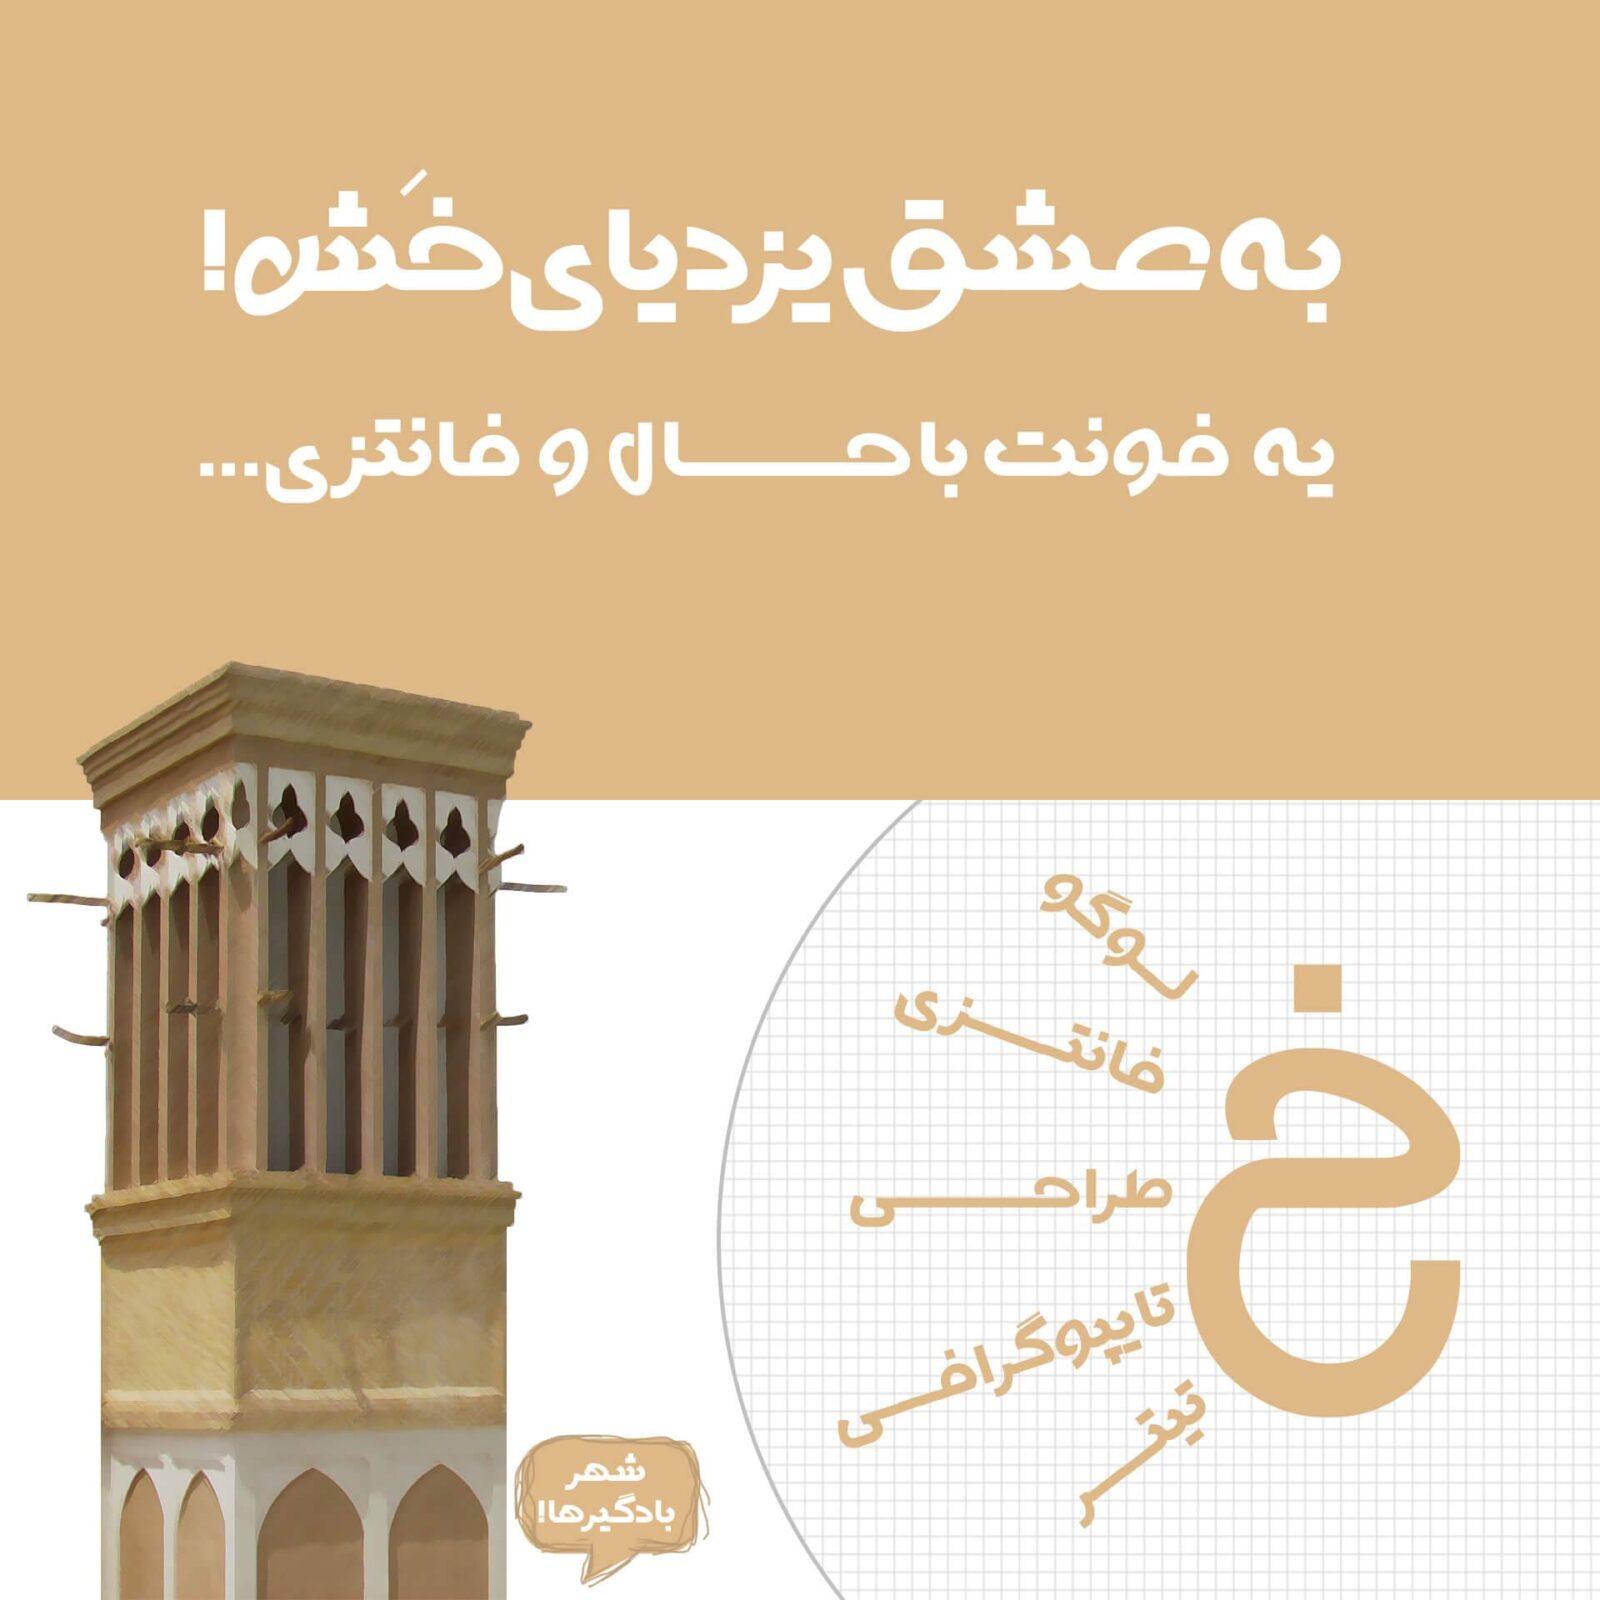 دانلود فونت خش – فونتی باحال مثل مردمان یزد – Khash Font